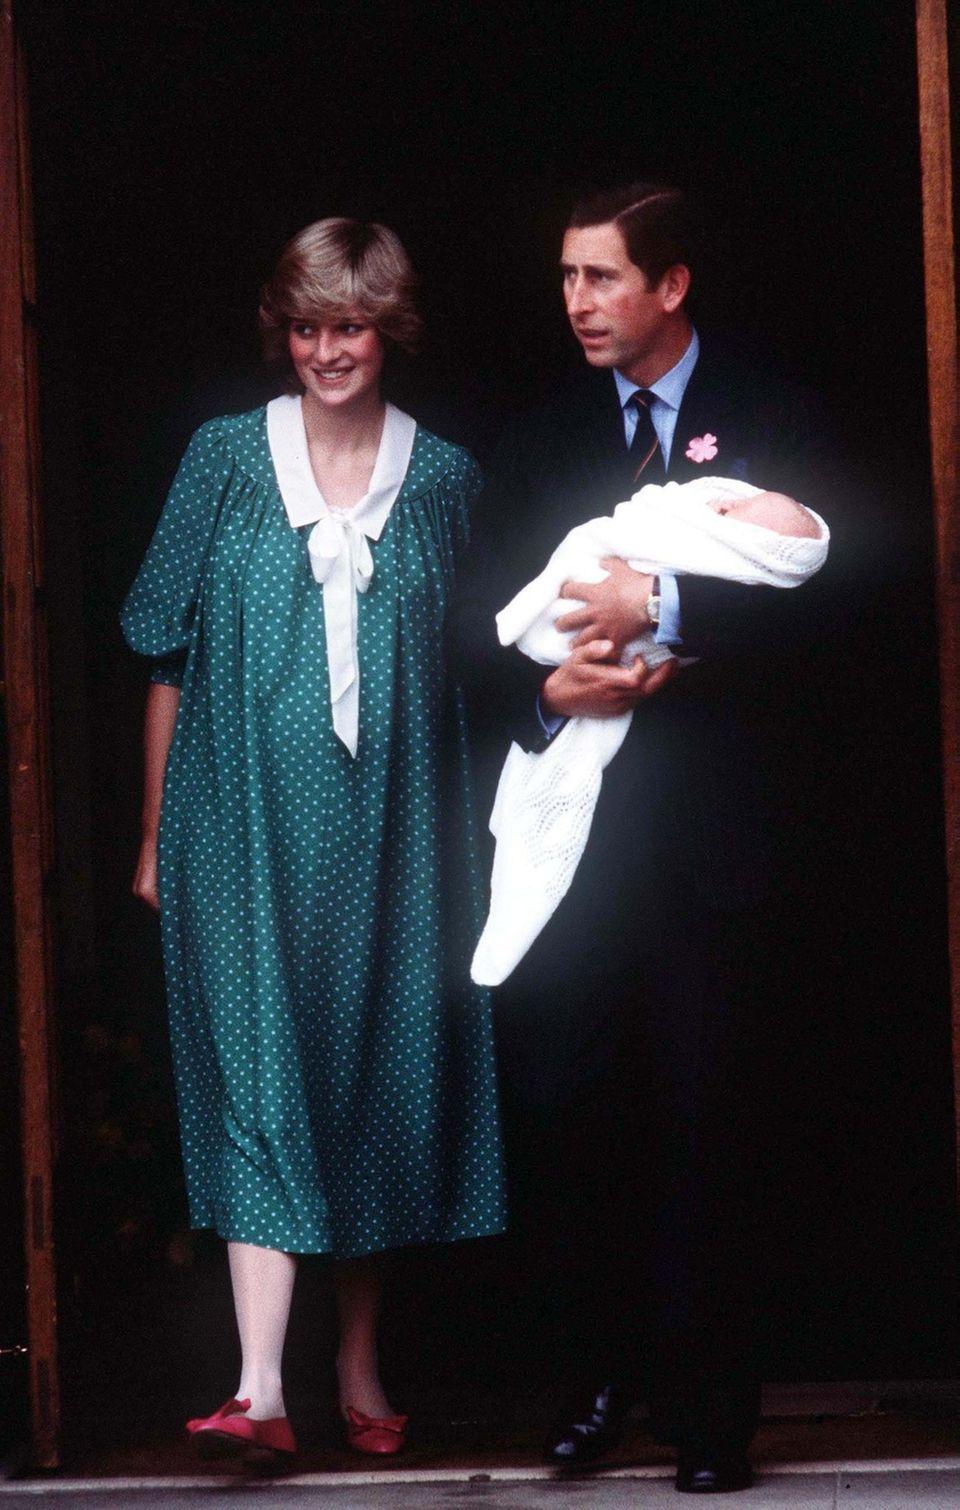 Prinzessin Diana und Prinz Charles mit Prinz William im Arm